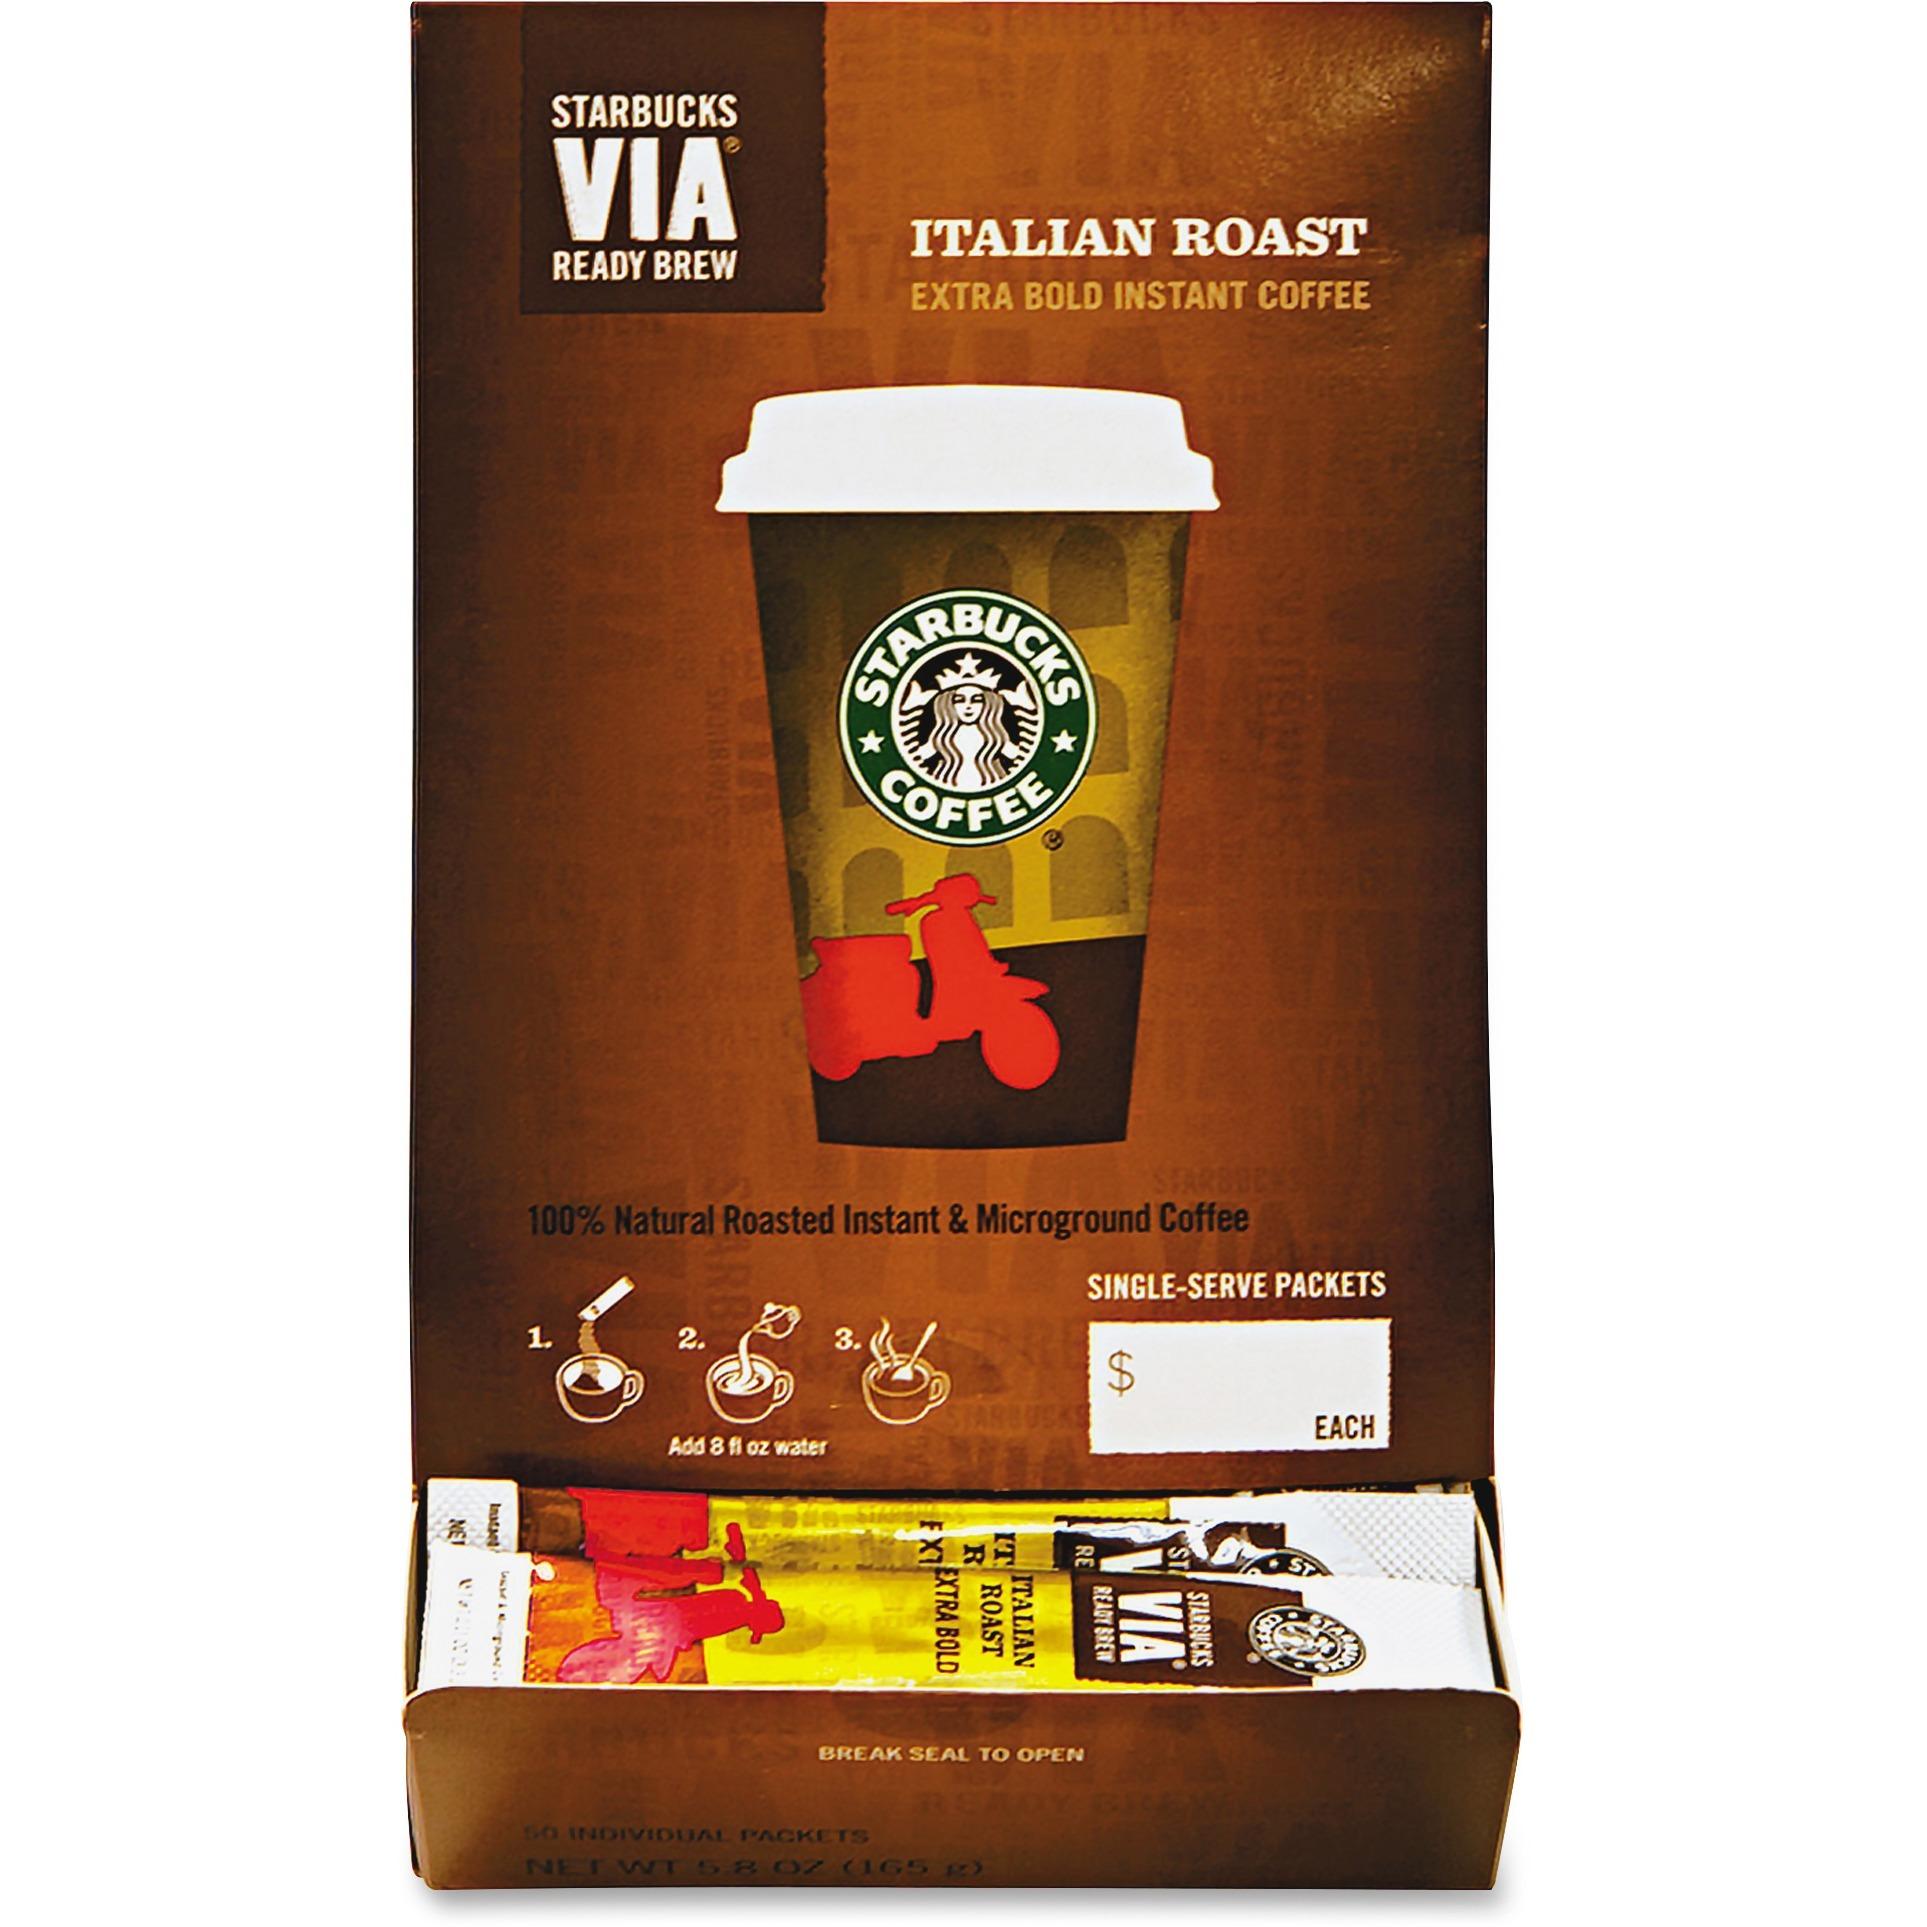 Starbucks, SBK11008130, VIA Ready Brew Italian Roast Coffee, 50 / Box